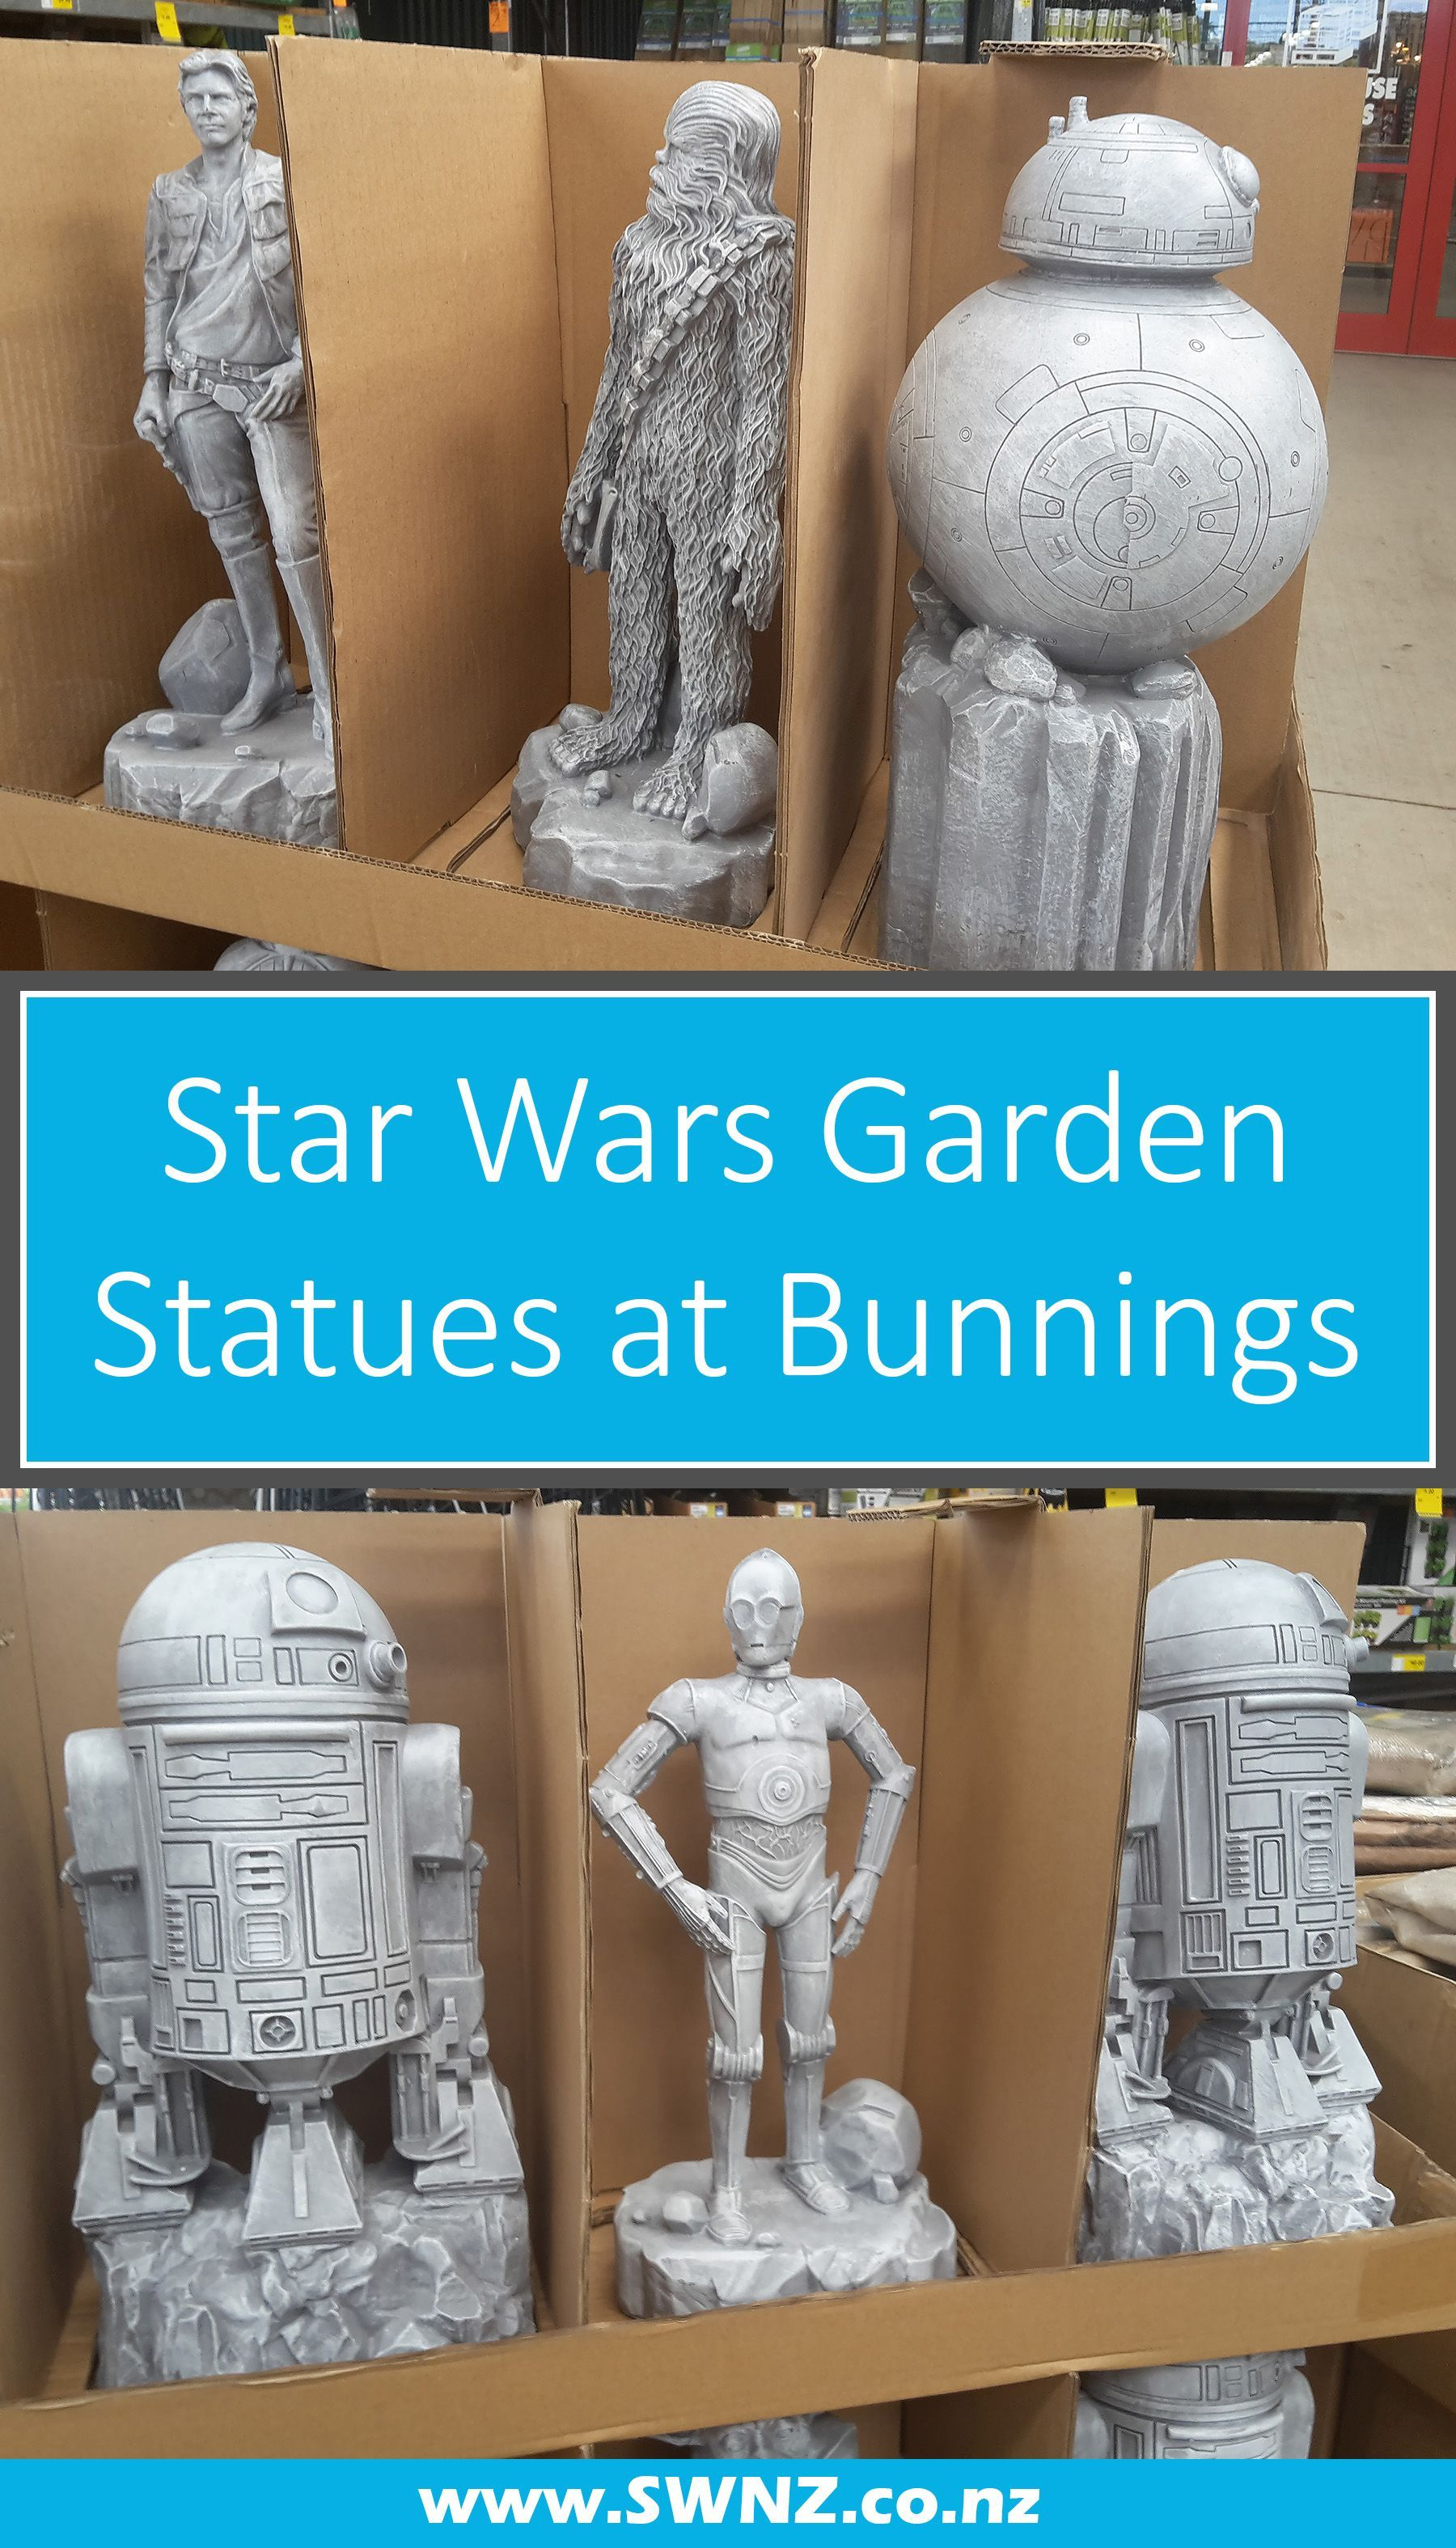 Theyre Back Star Wars Garden Statues At Bunnings Swnz Star Wars New Zealand Star Wars Bb8 Ideas Of Star Wars B Star Wars Diy Star Wars Decor Star Wars Bb8